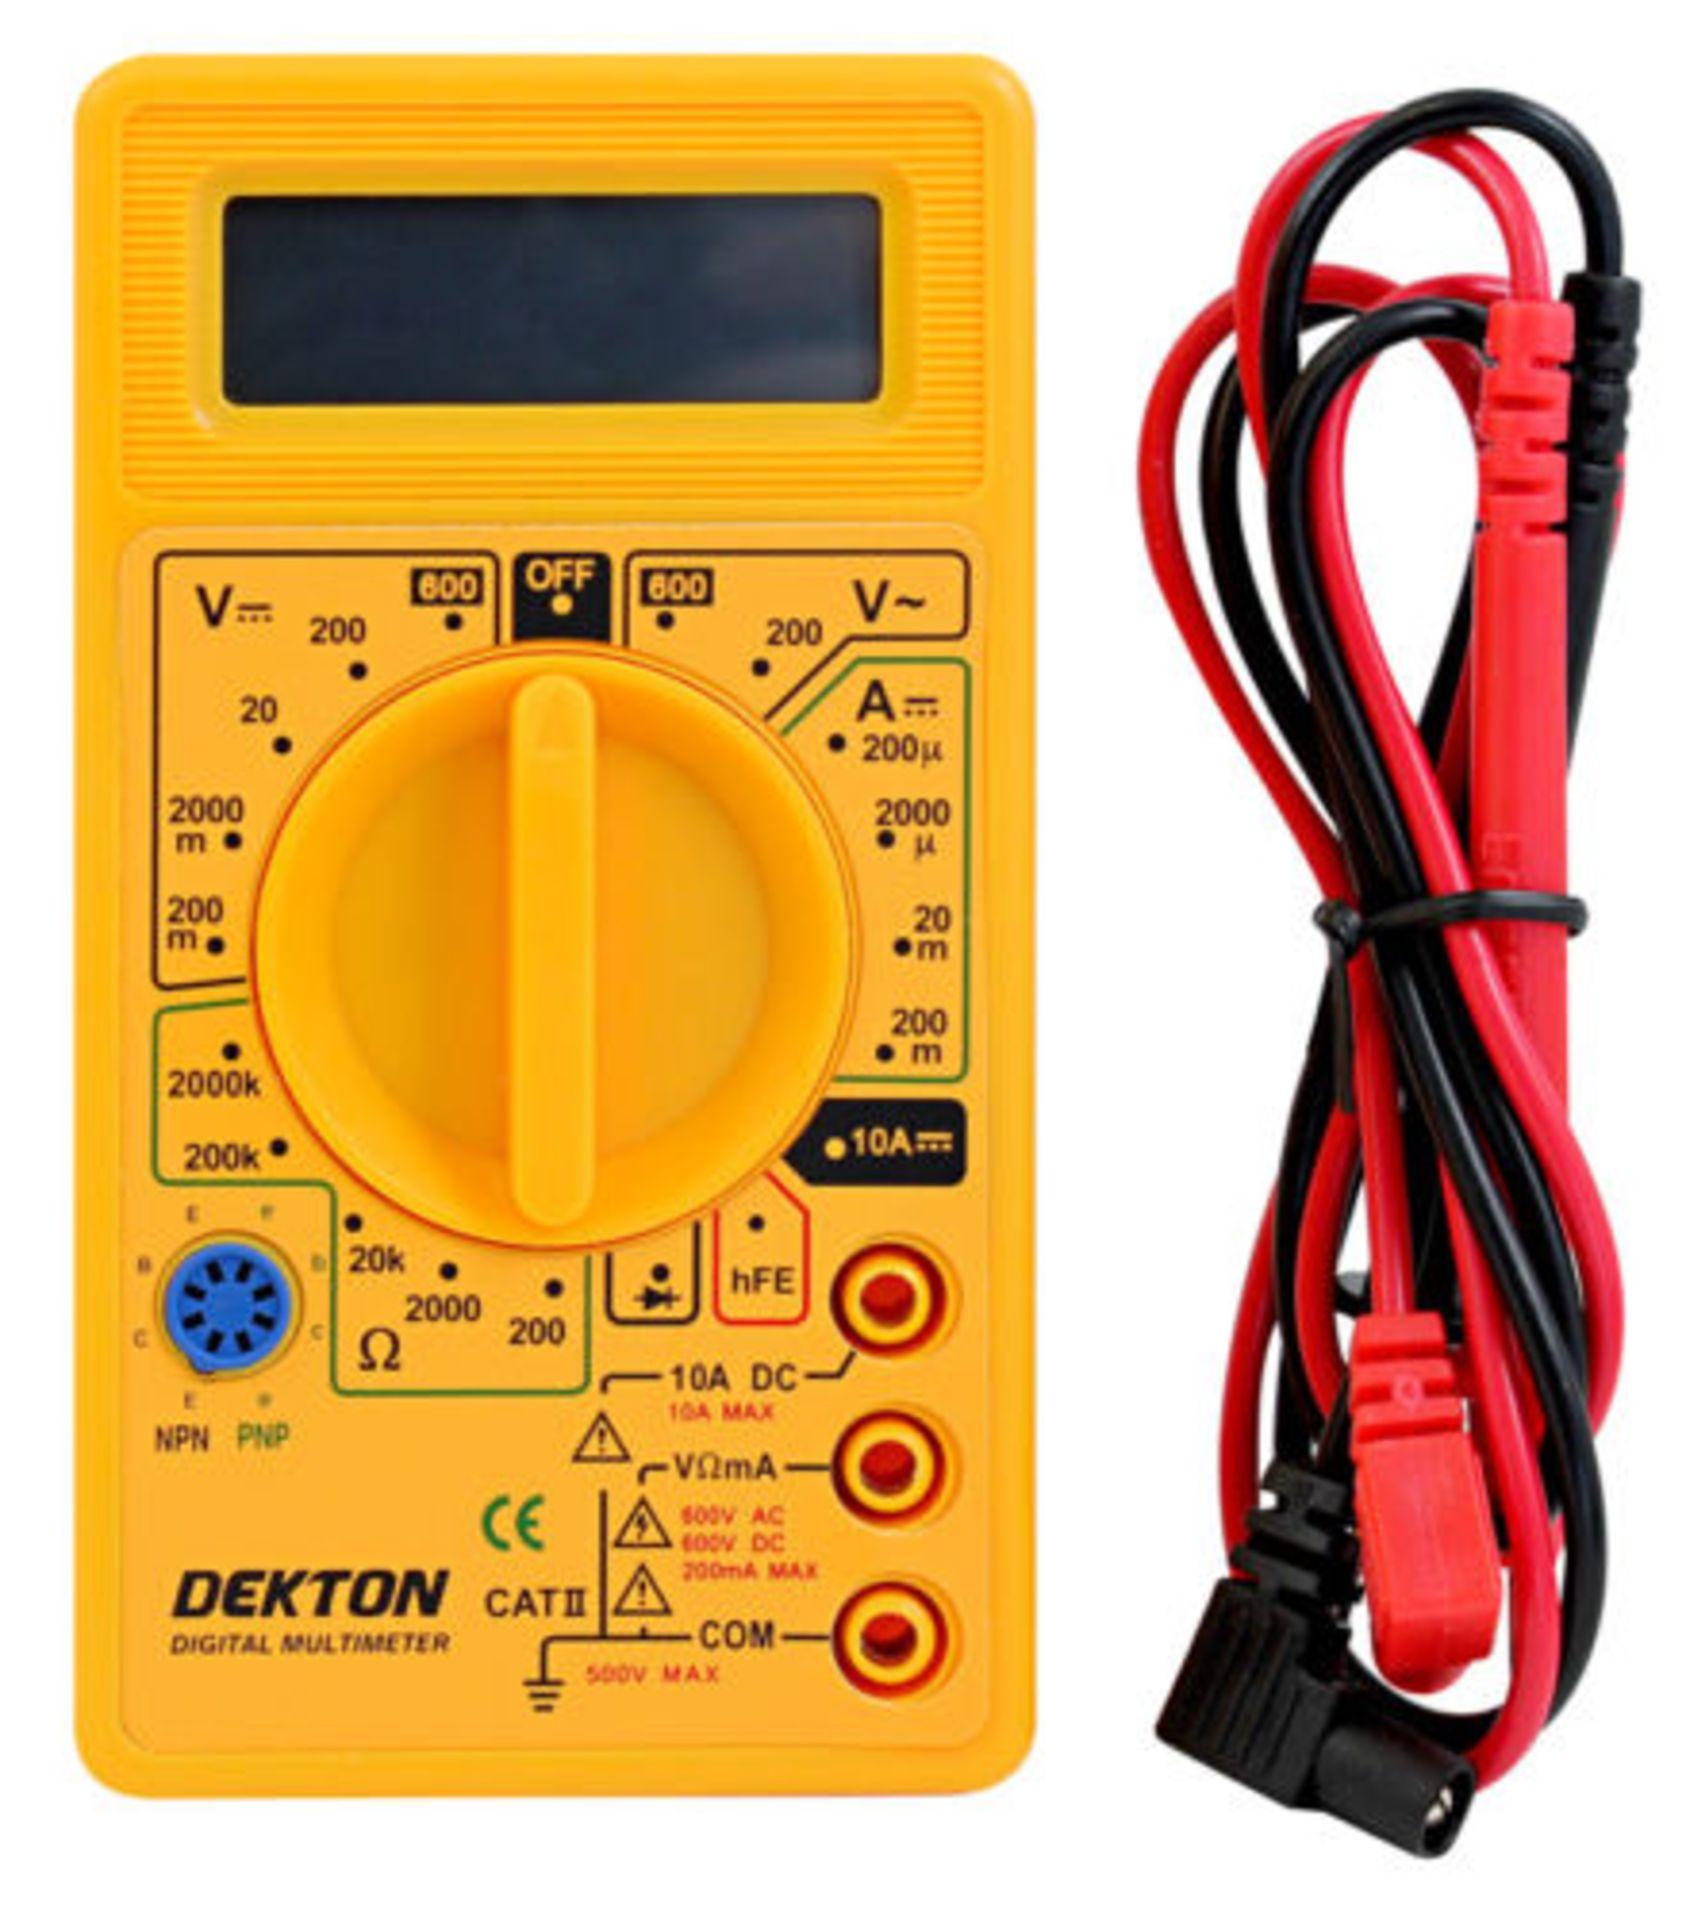 Lot 13535 - + VAT Brand New Dekton Digital Multimeter